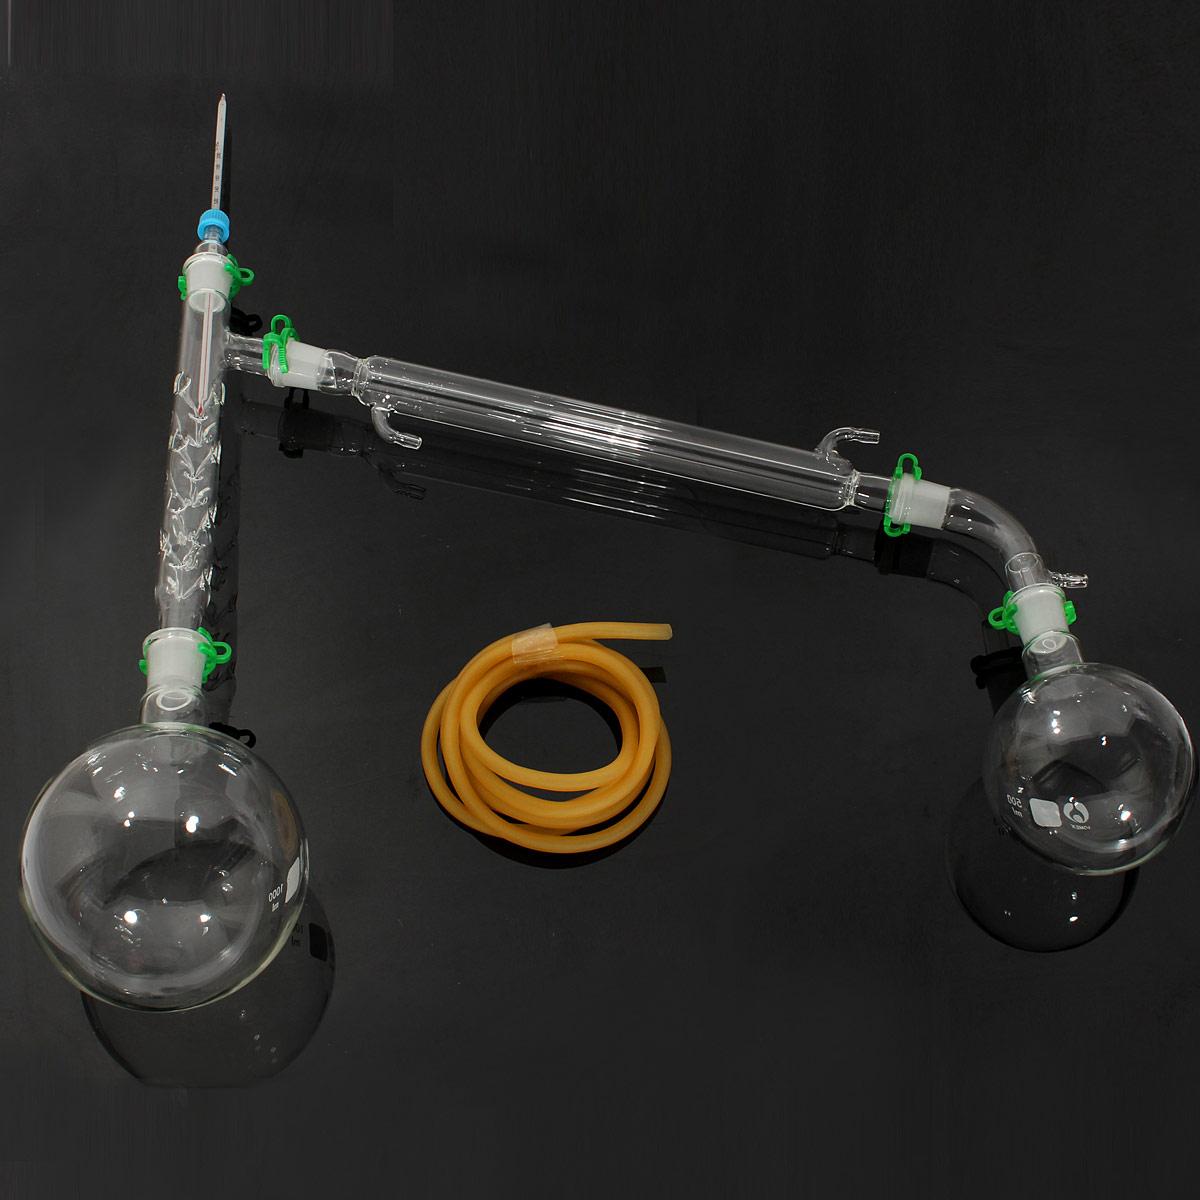 1000ml Chemistry Lab Distillation Apparatus Laboratory Chemistry Glassware Kit Set Glass Distilling Distillation Apparatus 24/29